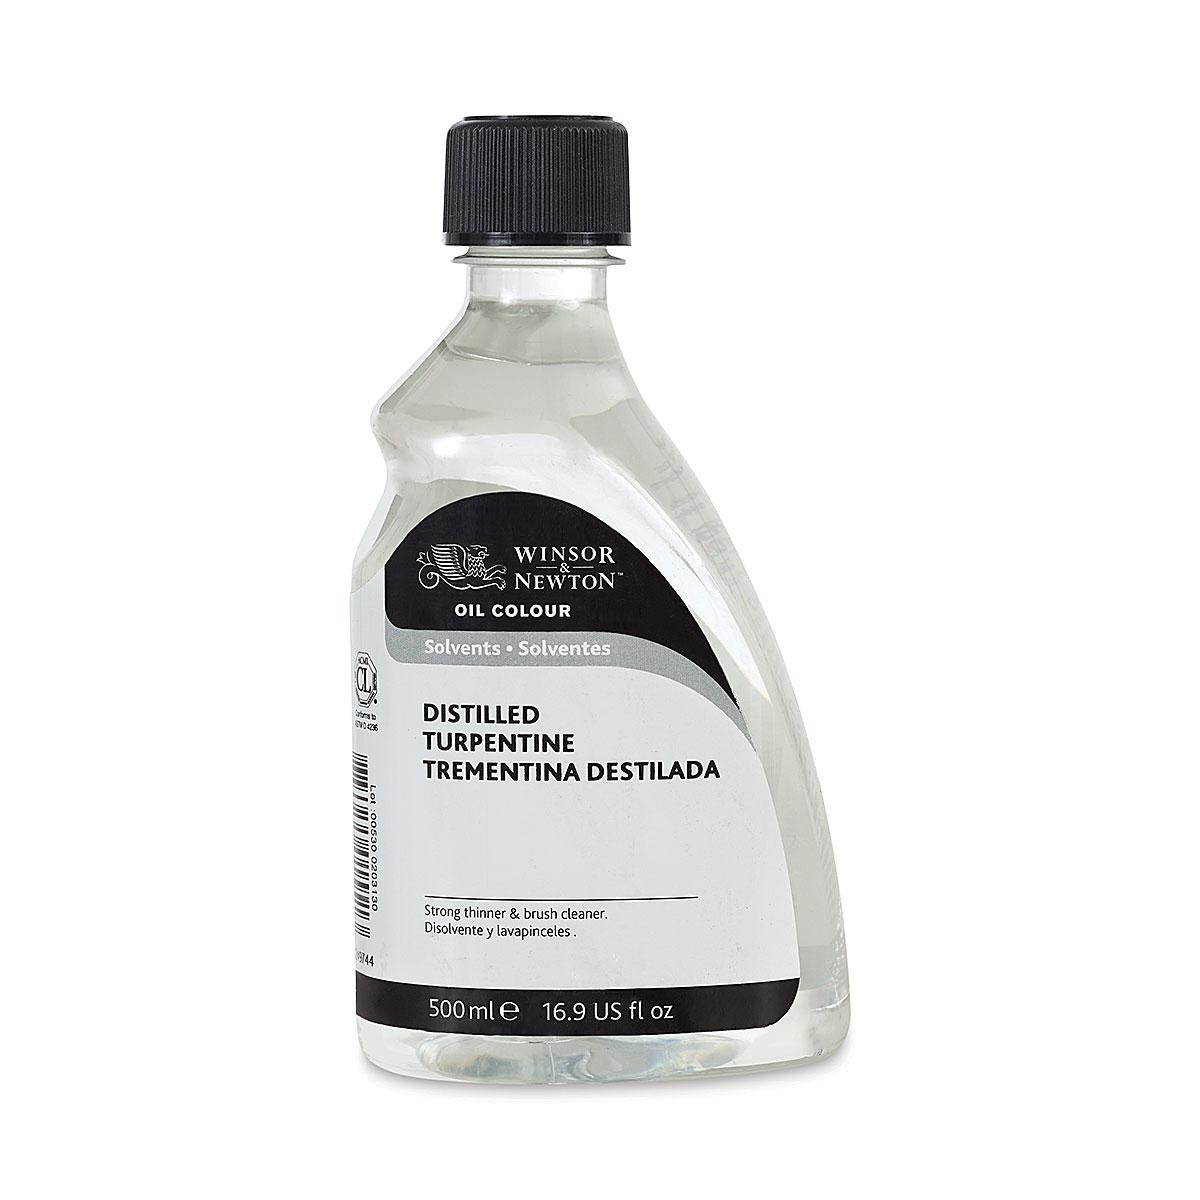 Winsor & Newton Distilled Turpentine - 500 ml bottle